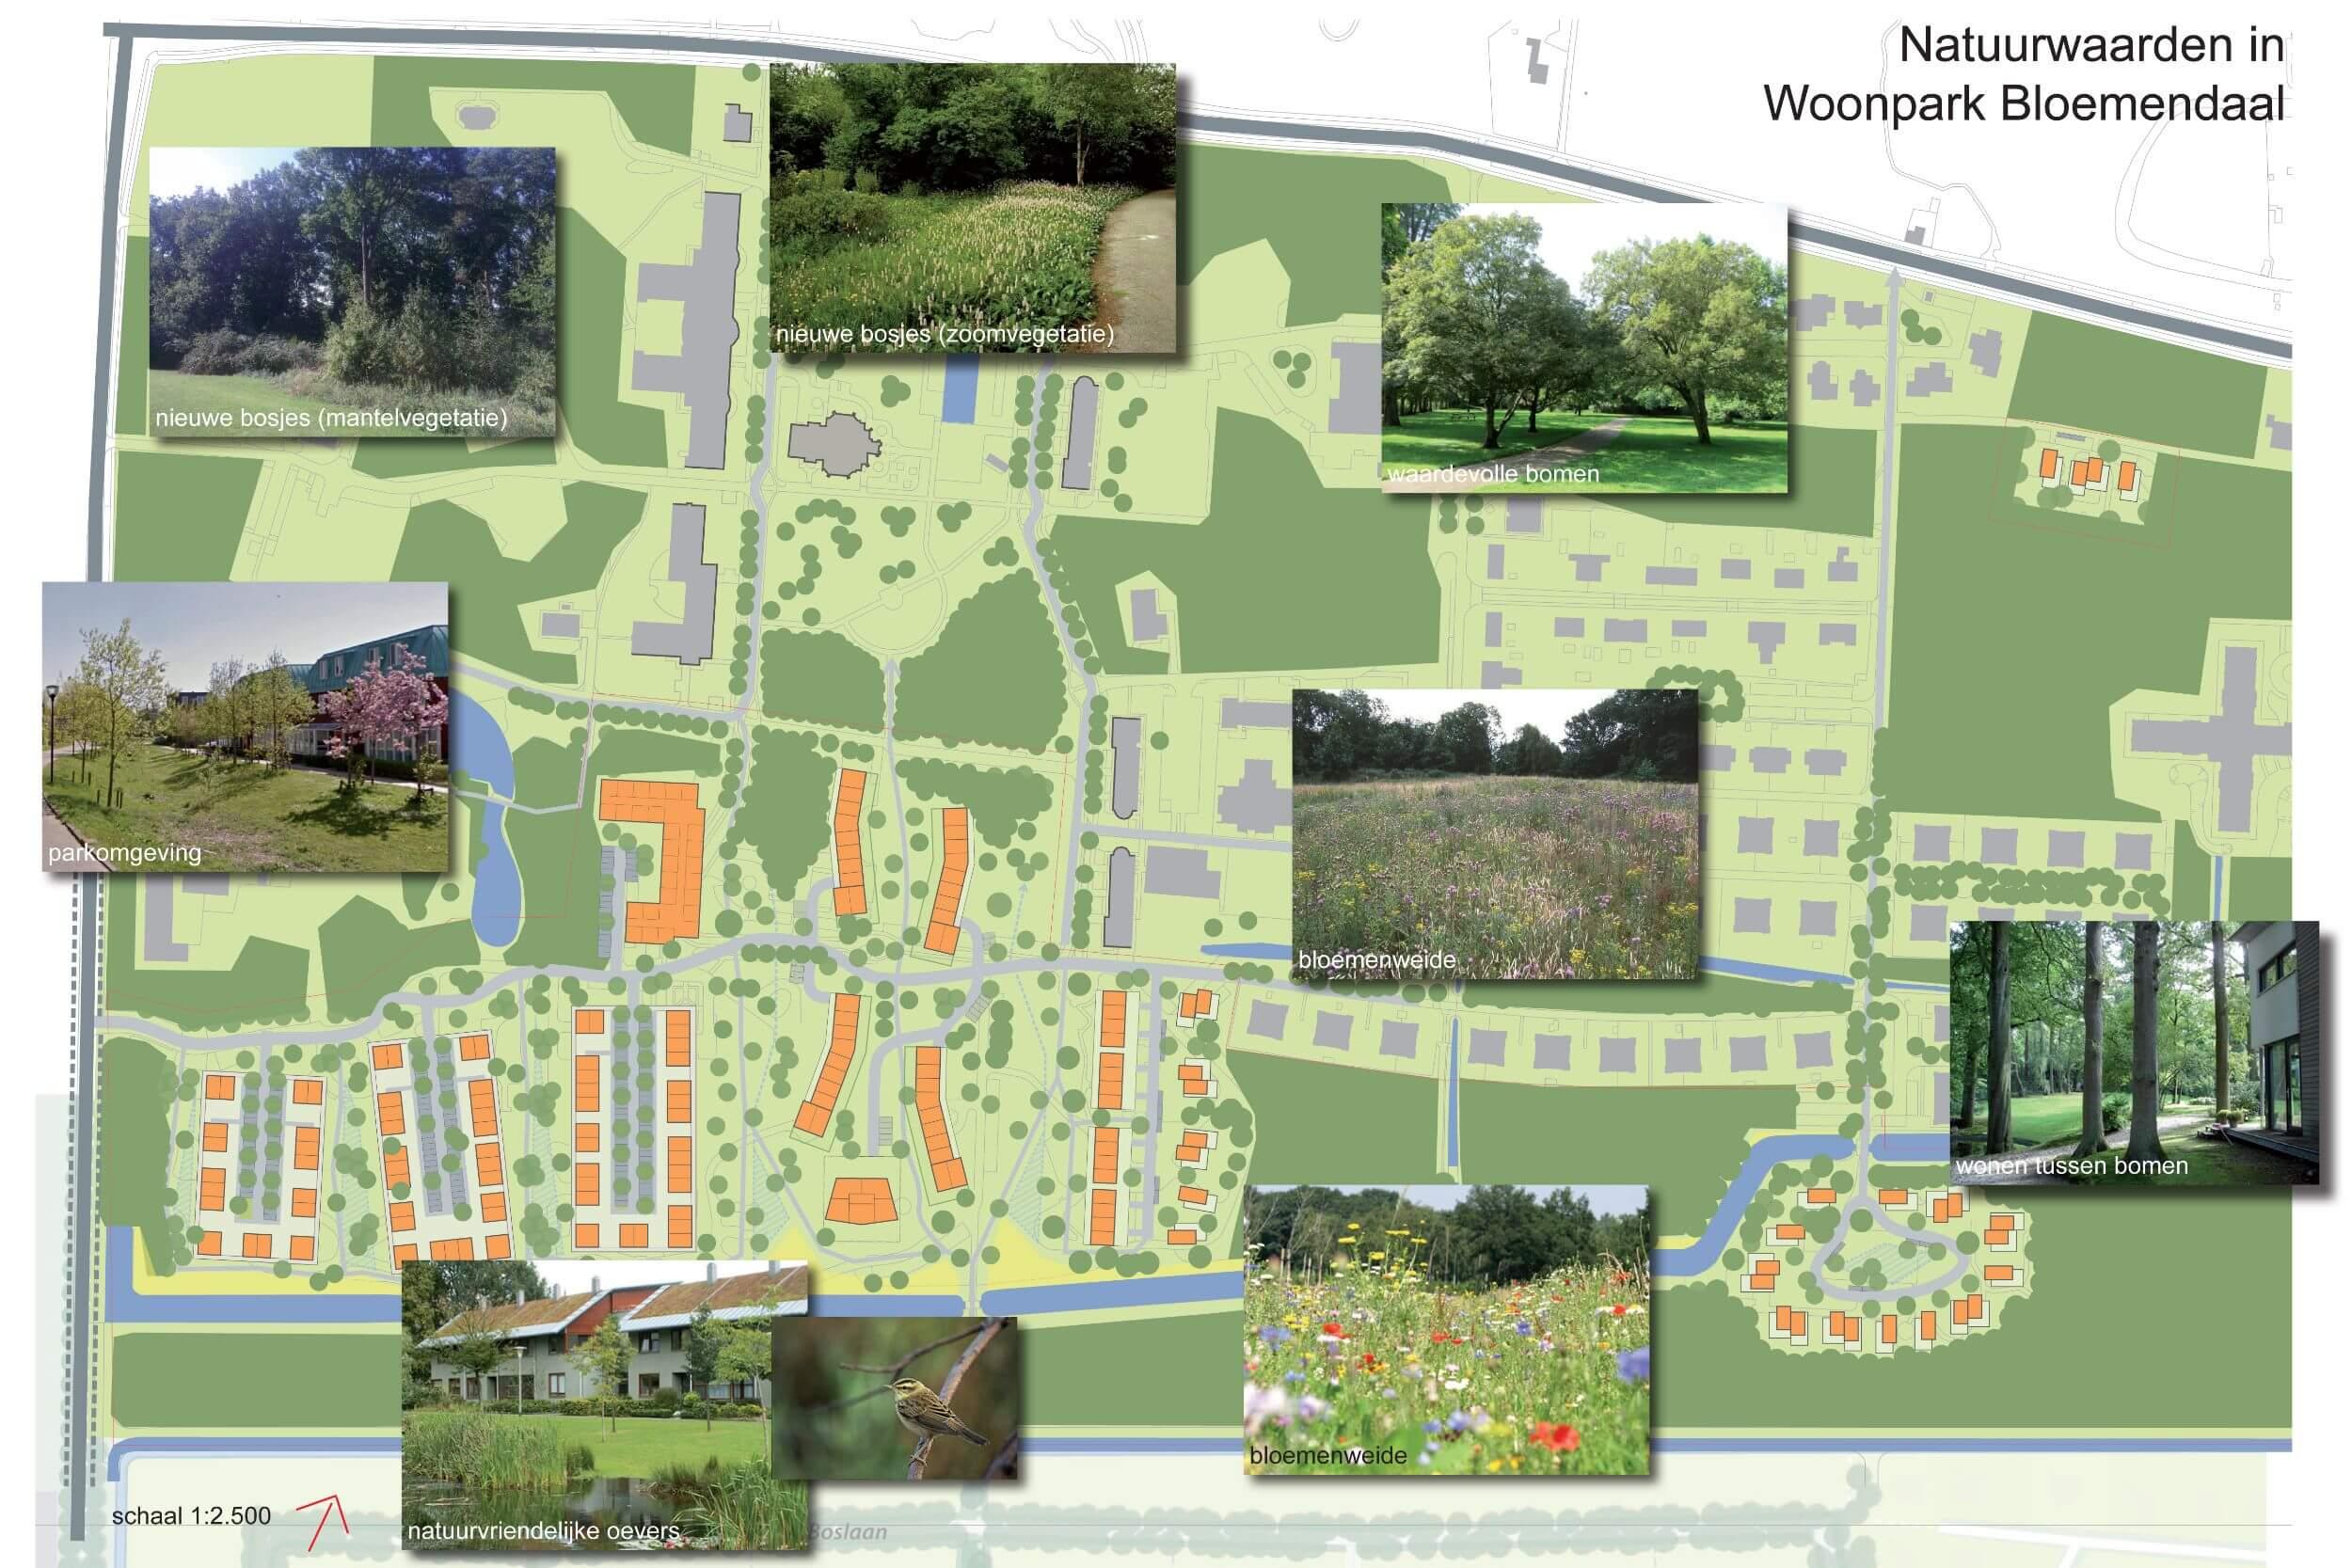 200629 15e werkboek Woonpark Bloemendaal Vollmer&P-11